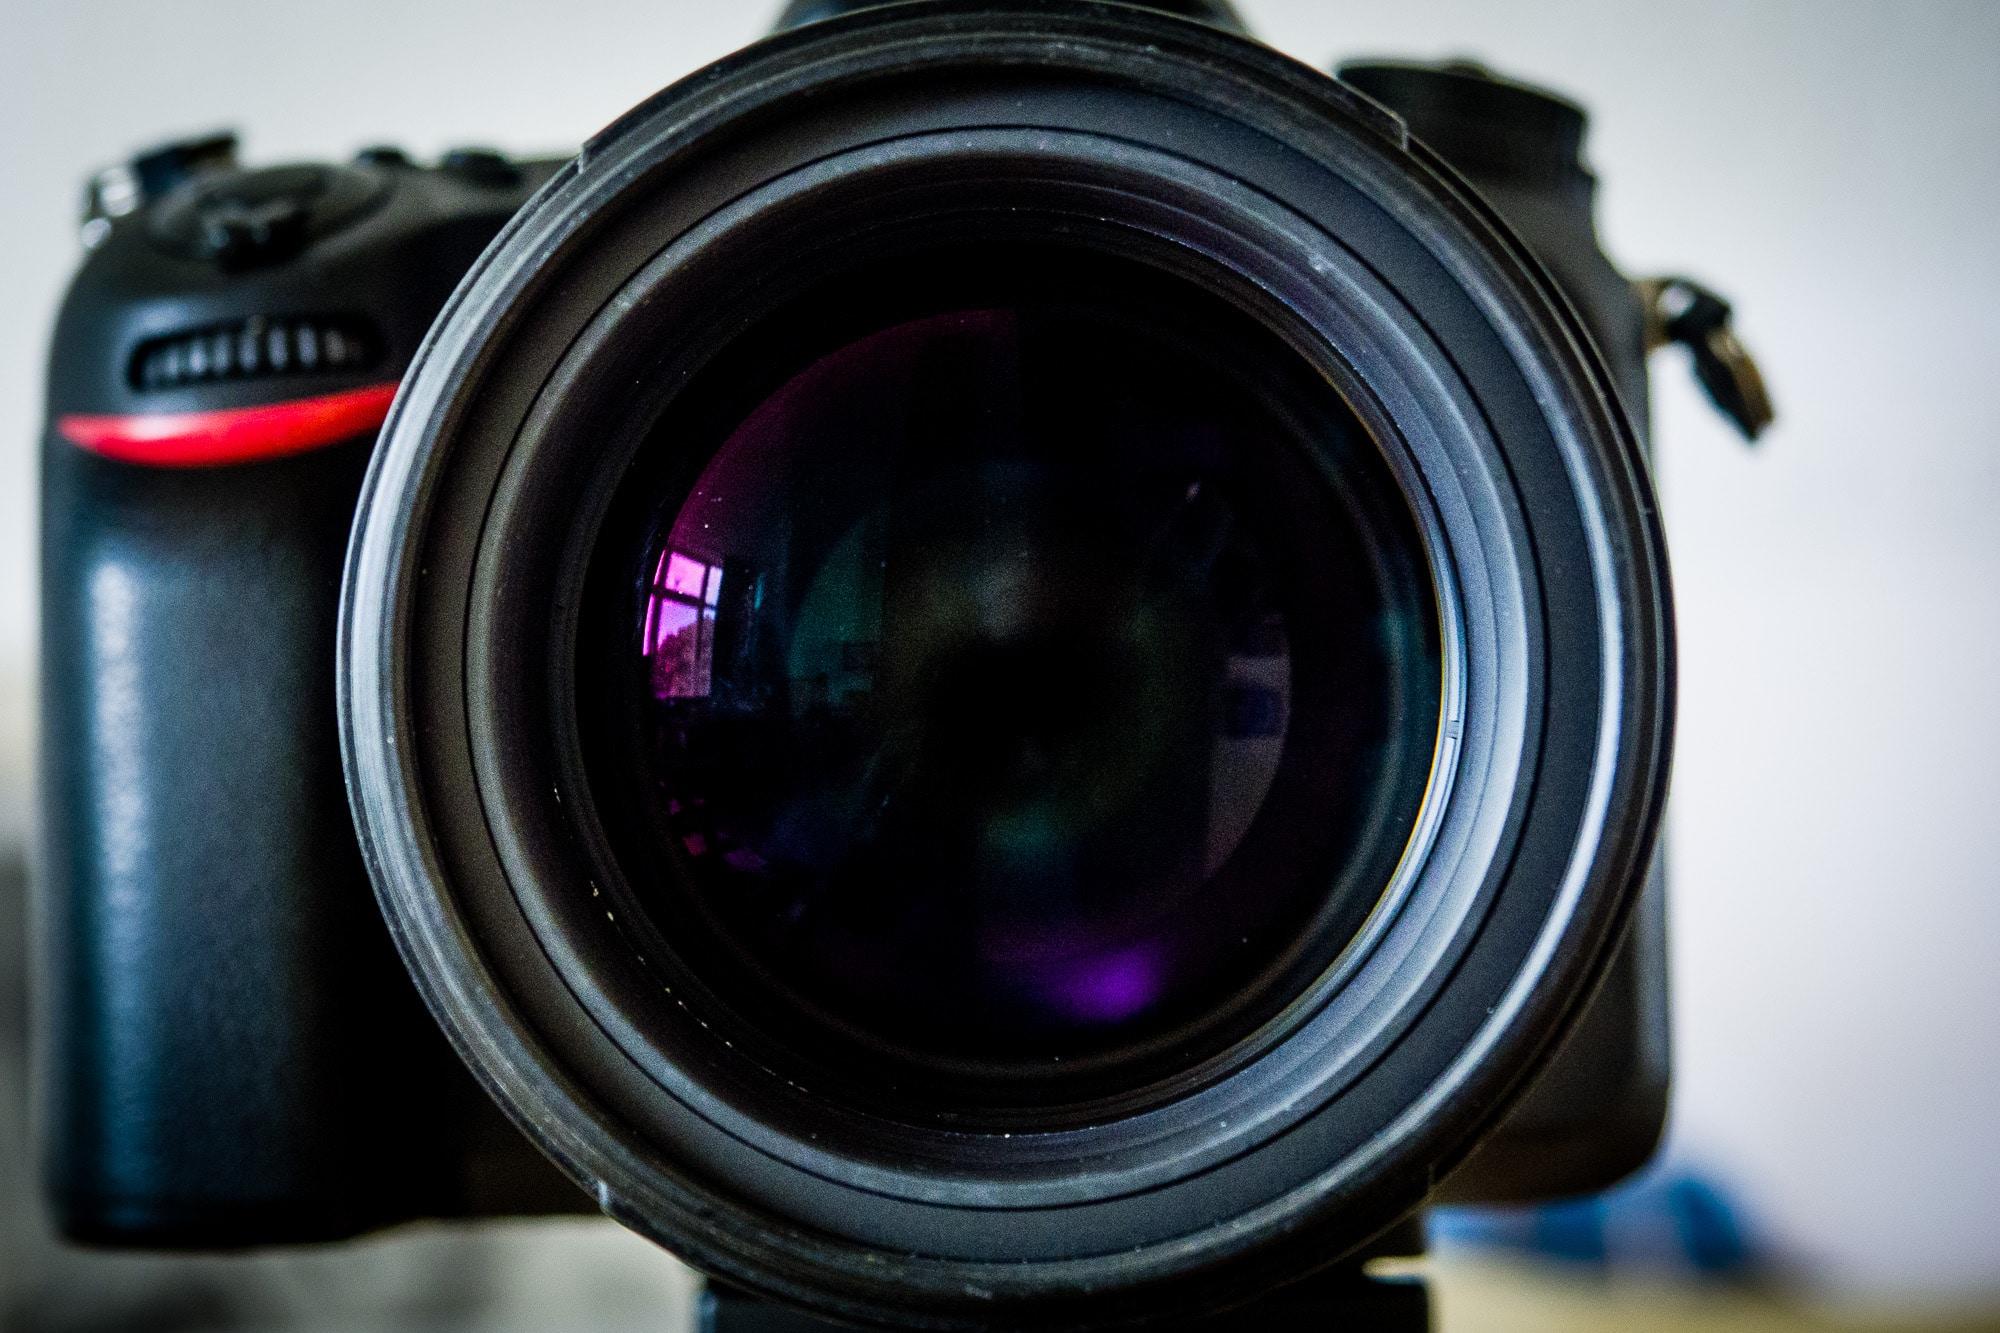 Nikon 85mm mit Blende 1.4, (Foto copyright - Frank Weber - Berlin - fotologbuch.de)